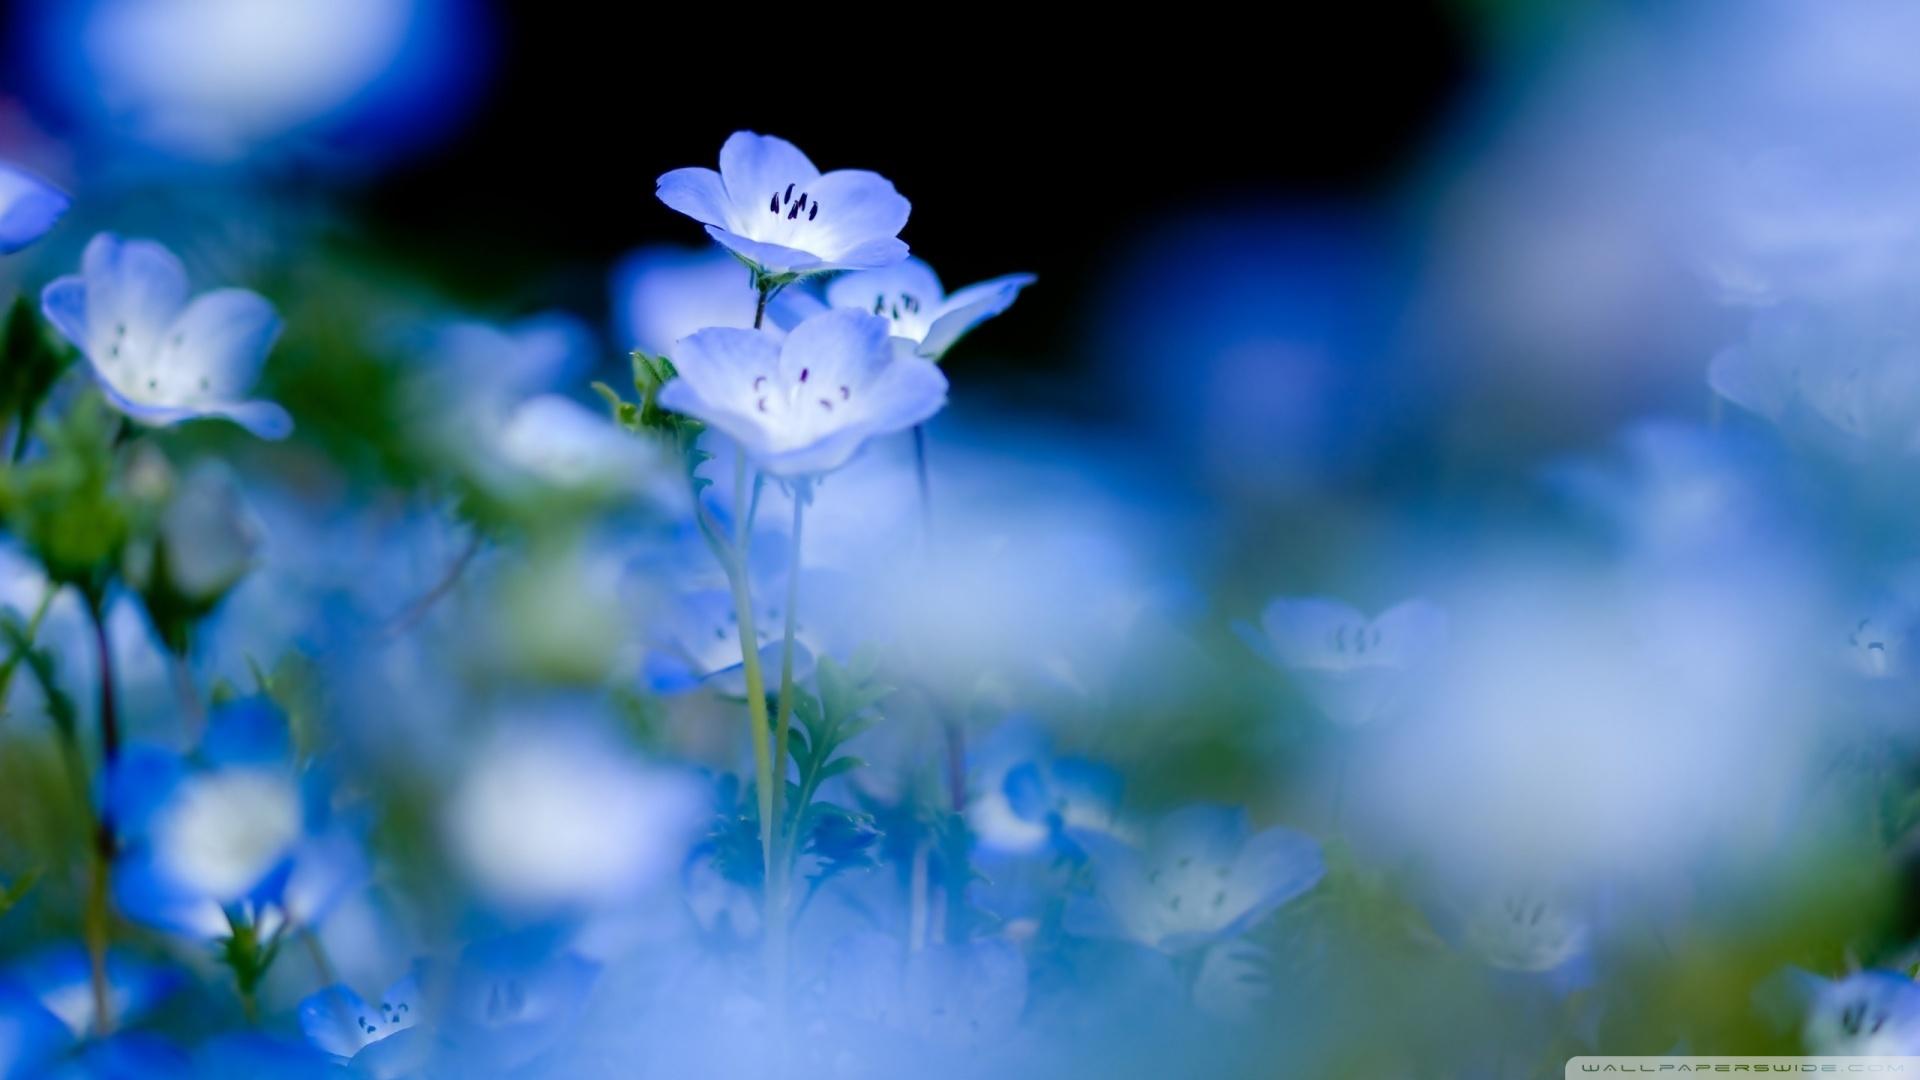 Blue Flowers Macro 2 Wallpaper 1920x1080 Blue Flowers Macro 2 1920x1080